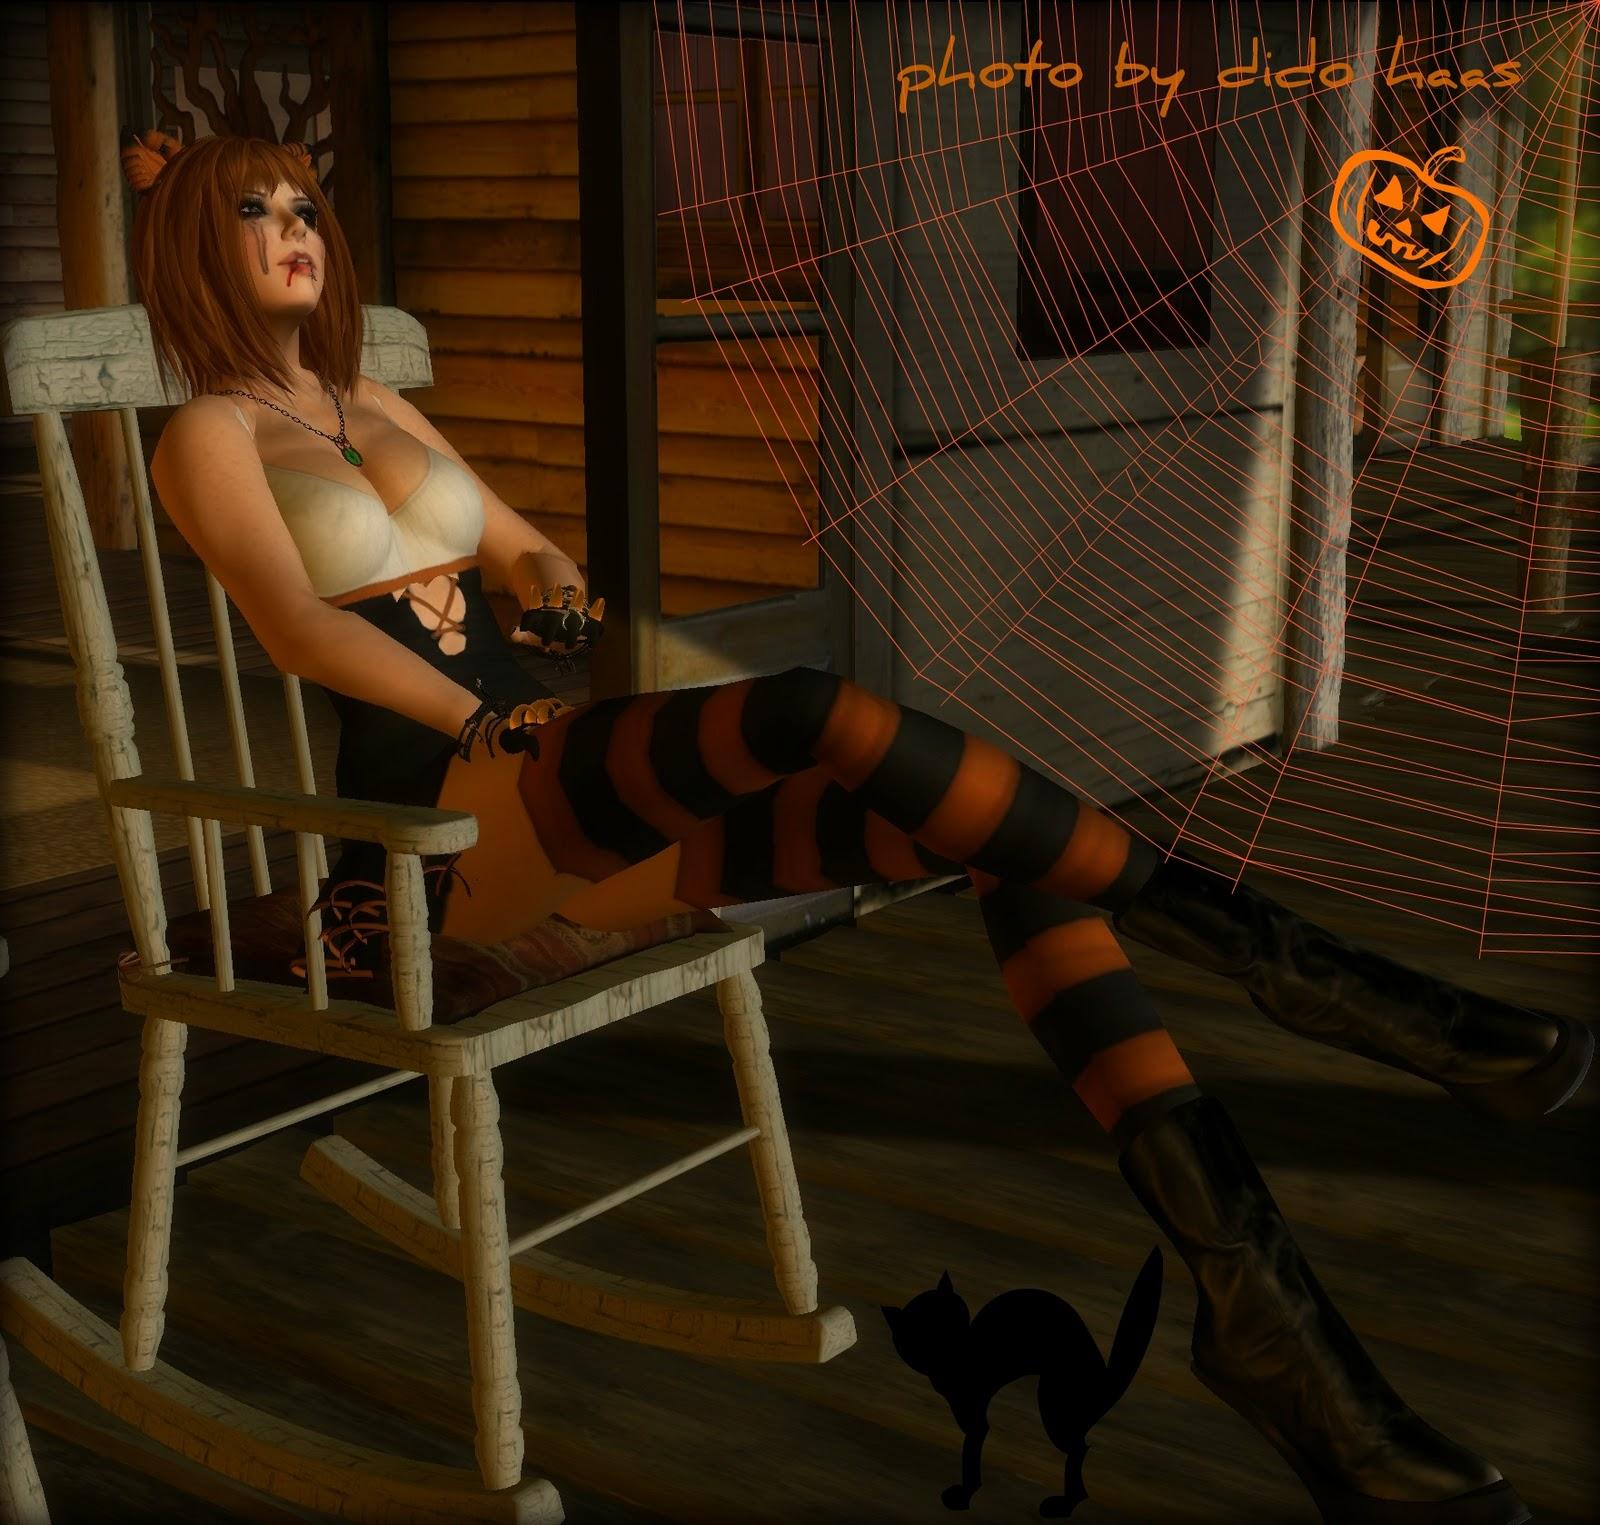 http://3.bp.blogspot.com/-P1HIByjvvi0/ToxkigHFAVI/AAAAAAAAFV4/DYmpg6BnhhY/s1600/halloween+01.jpg